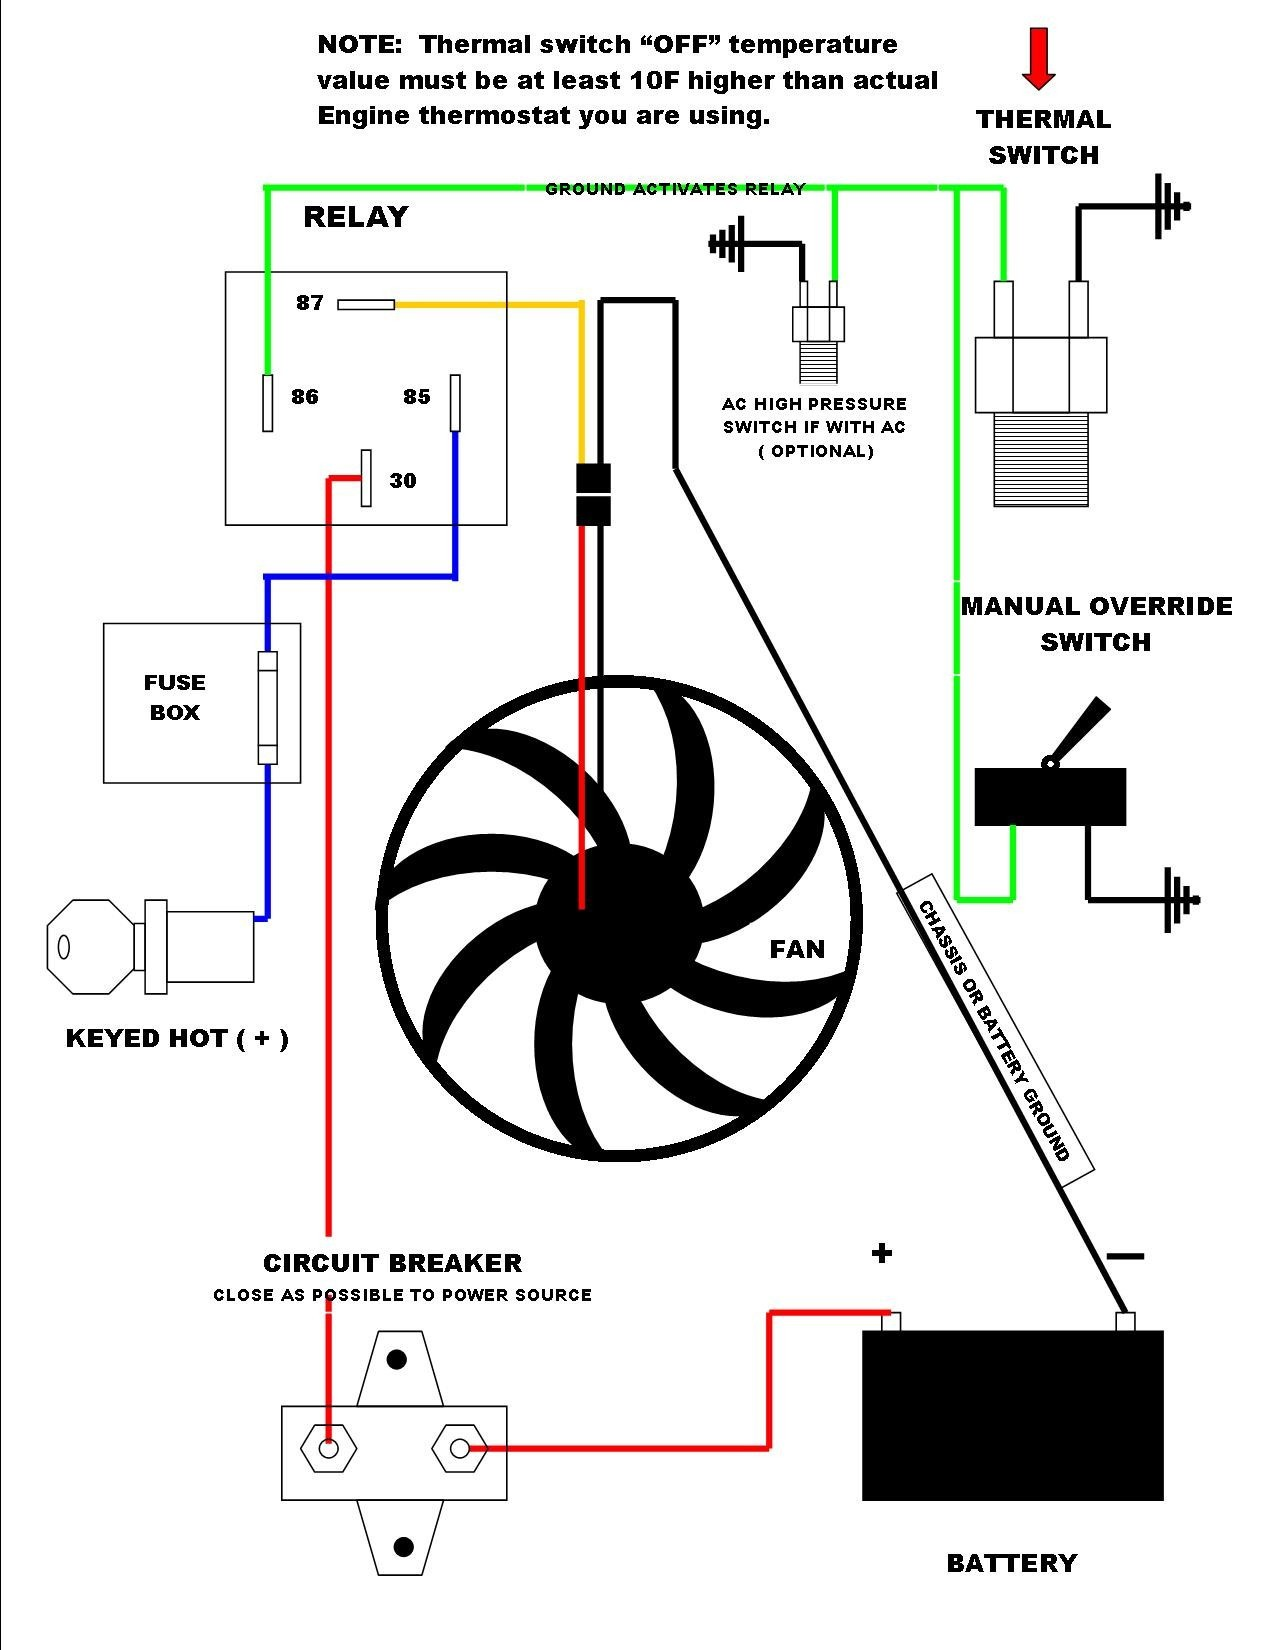 Wiring Diagram Relay New Fresh Spal Electric Fan Wiring Diagram